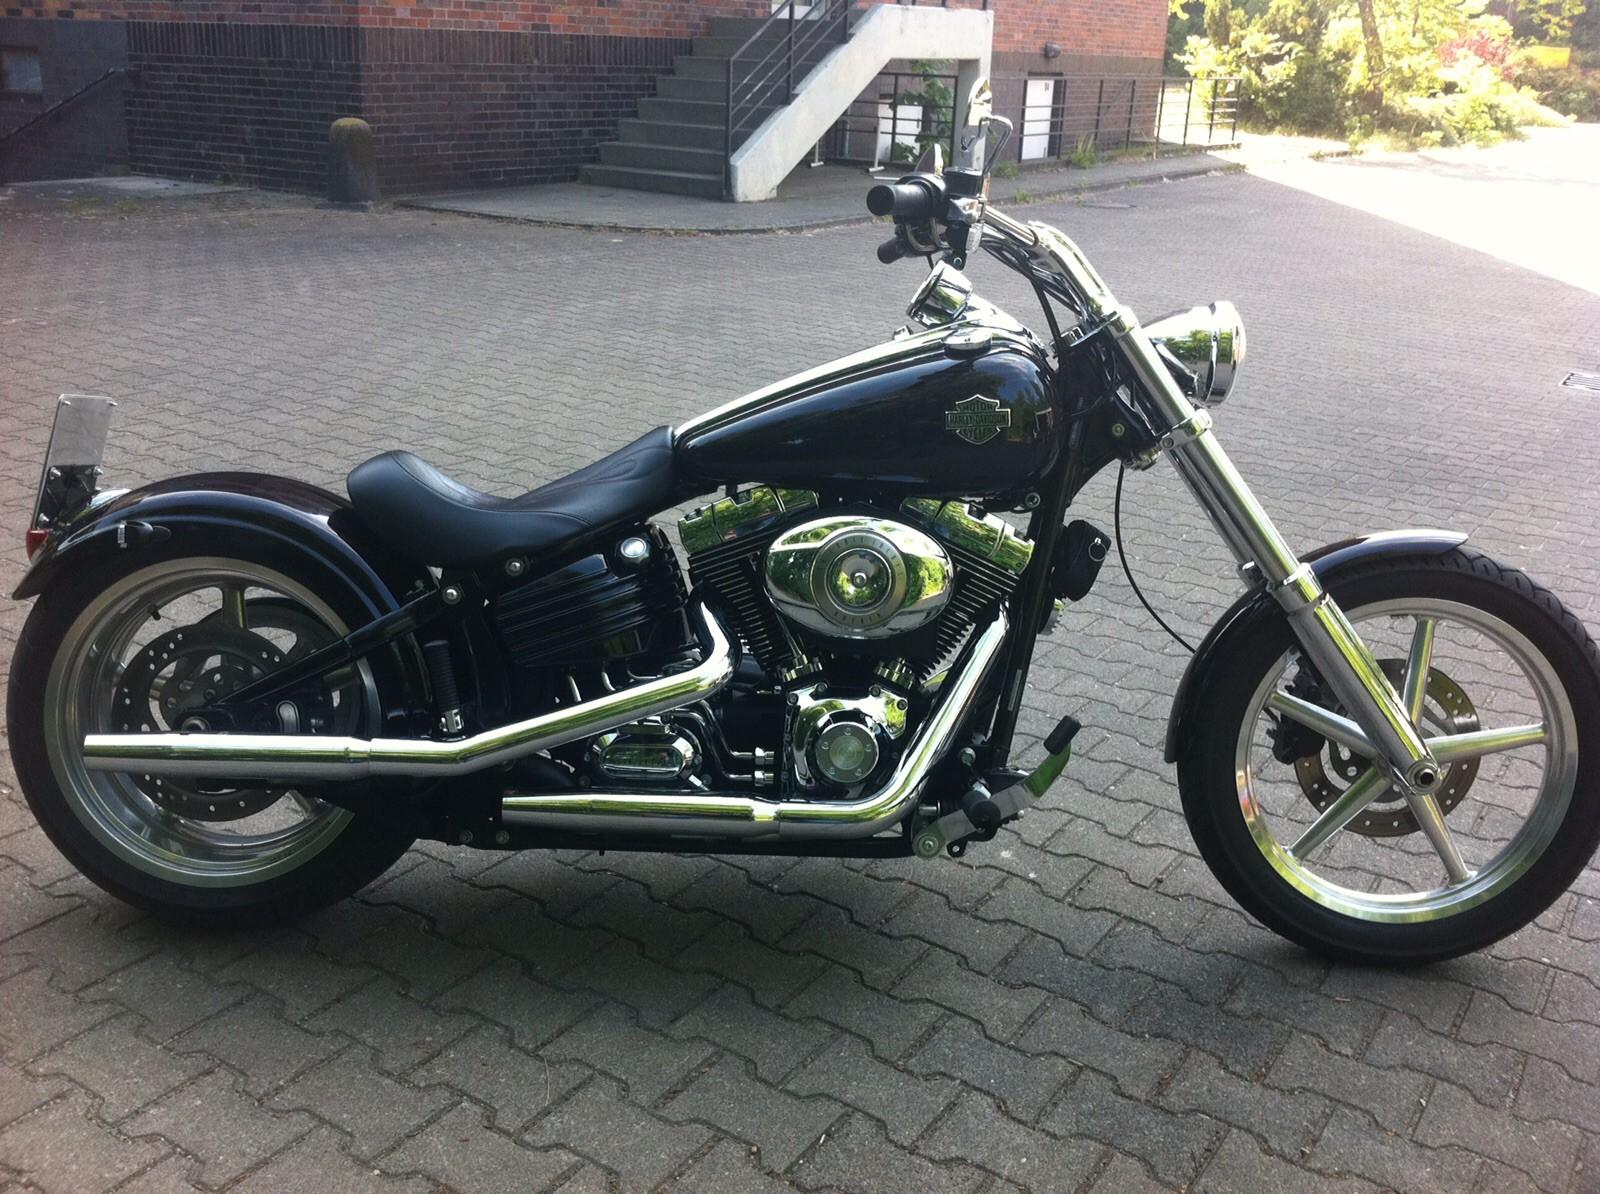 Harley Davidson American Honda Motor Company Merger